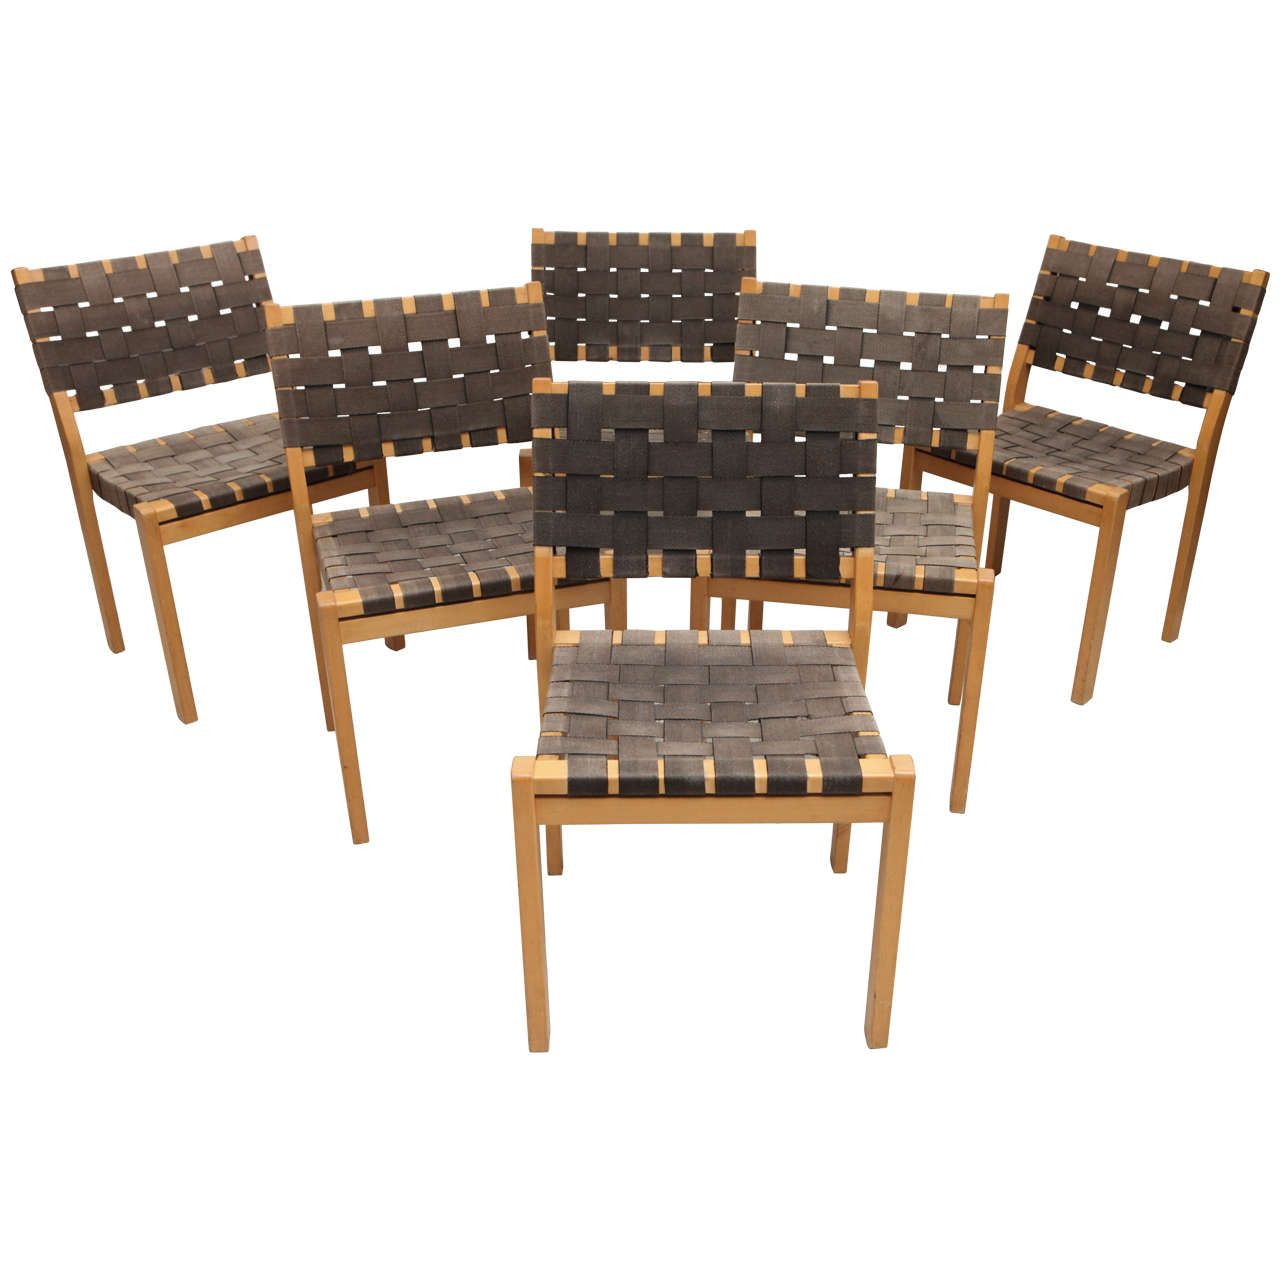 Set of Six Alvar Aalto Woven Seat Dining Chairs | Cranks ...